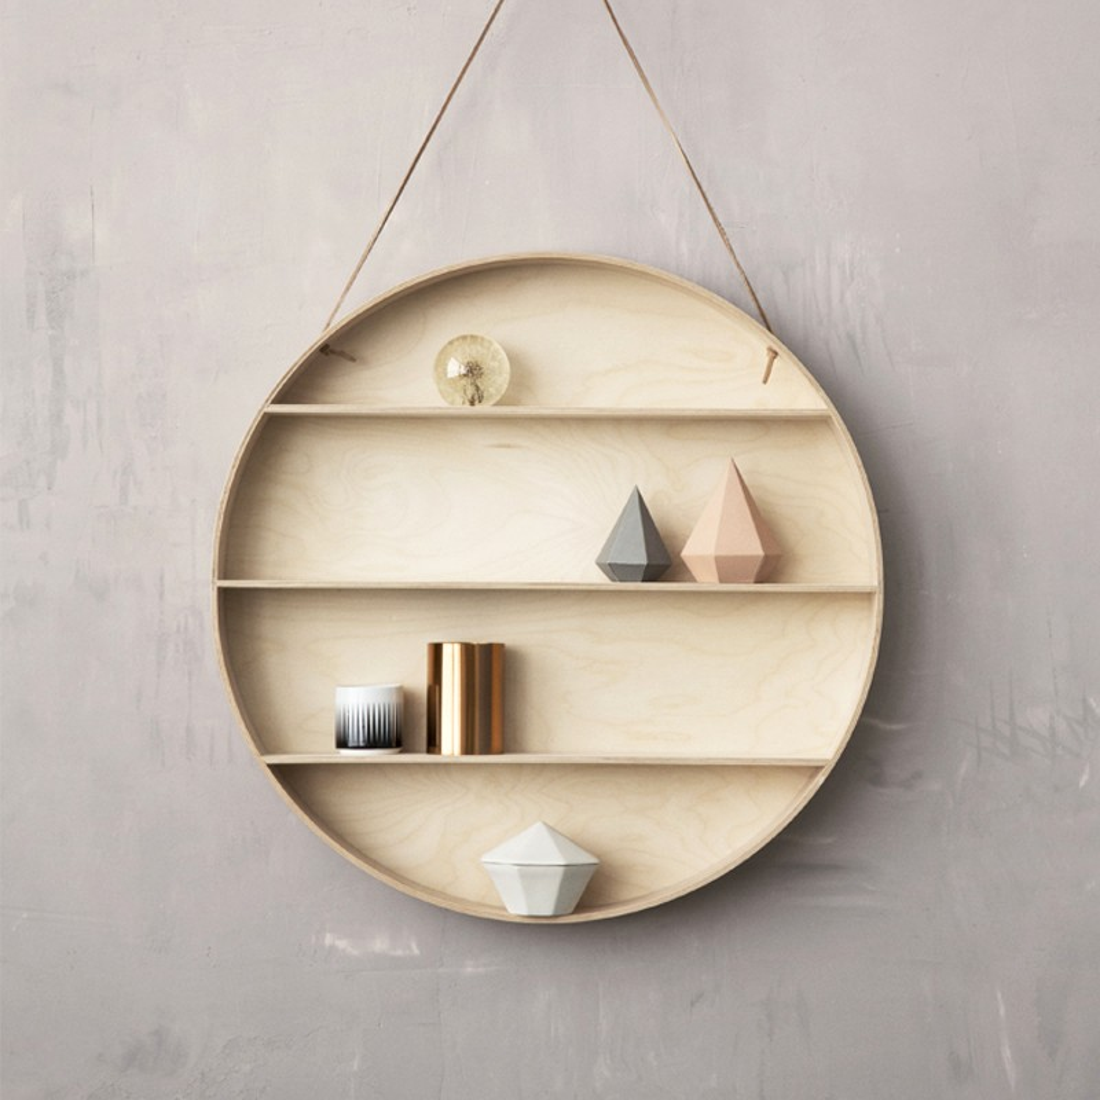 kinderzimmer regal round dorm ferm living kleine fabriek. Black Bedroom Furniture Sets. Home Design Ideas